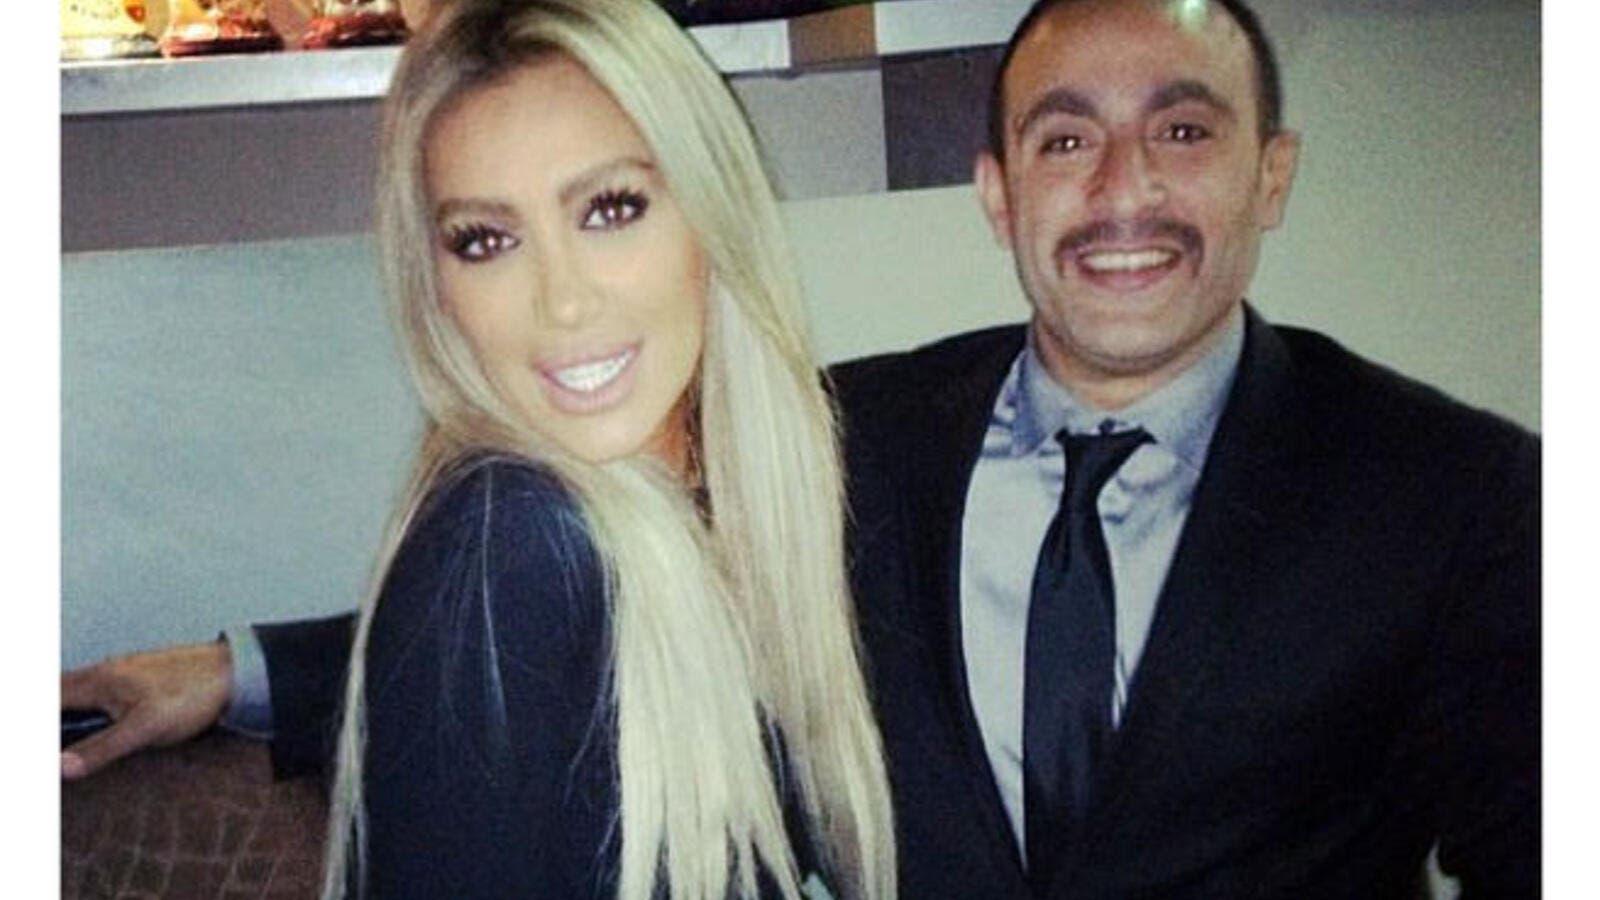 Wicked sweet 'stache: Maya Diab posts pic of Ahmad Al Sakka's new